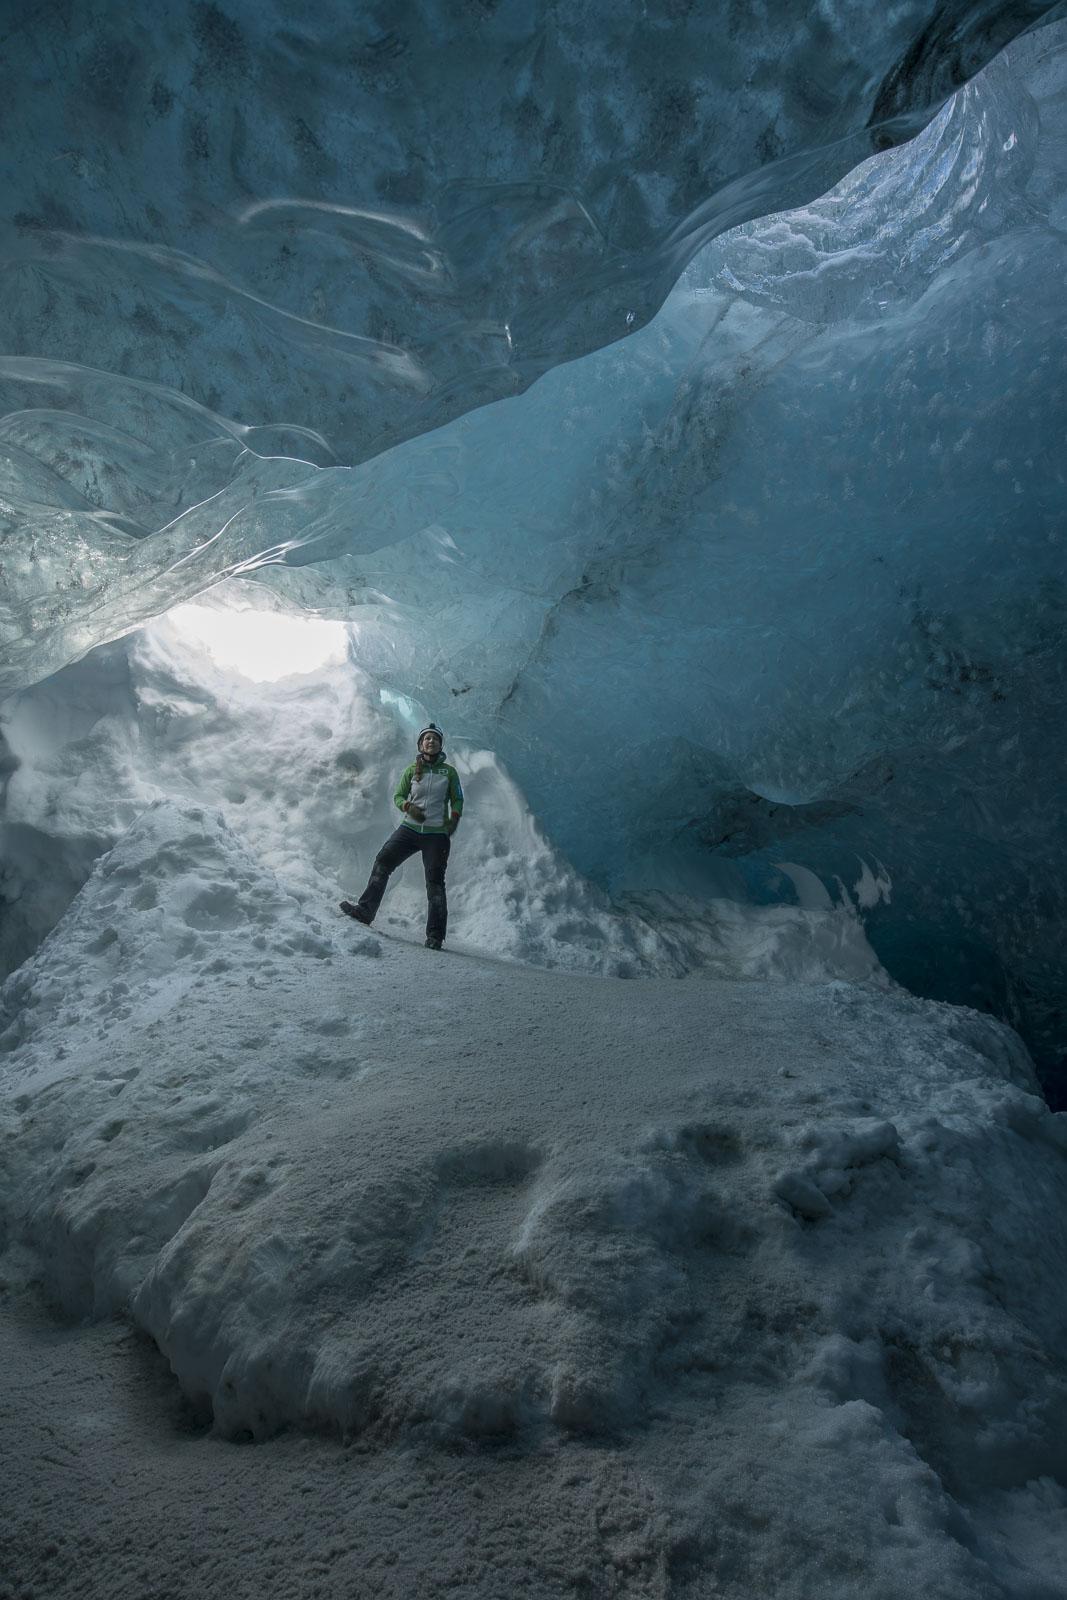 icecave-6.jpg